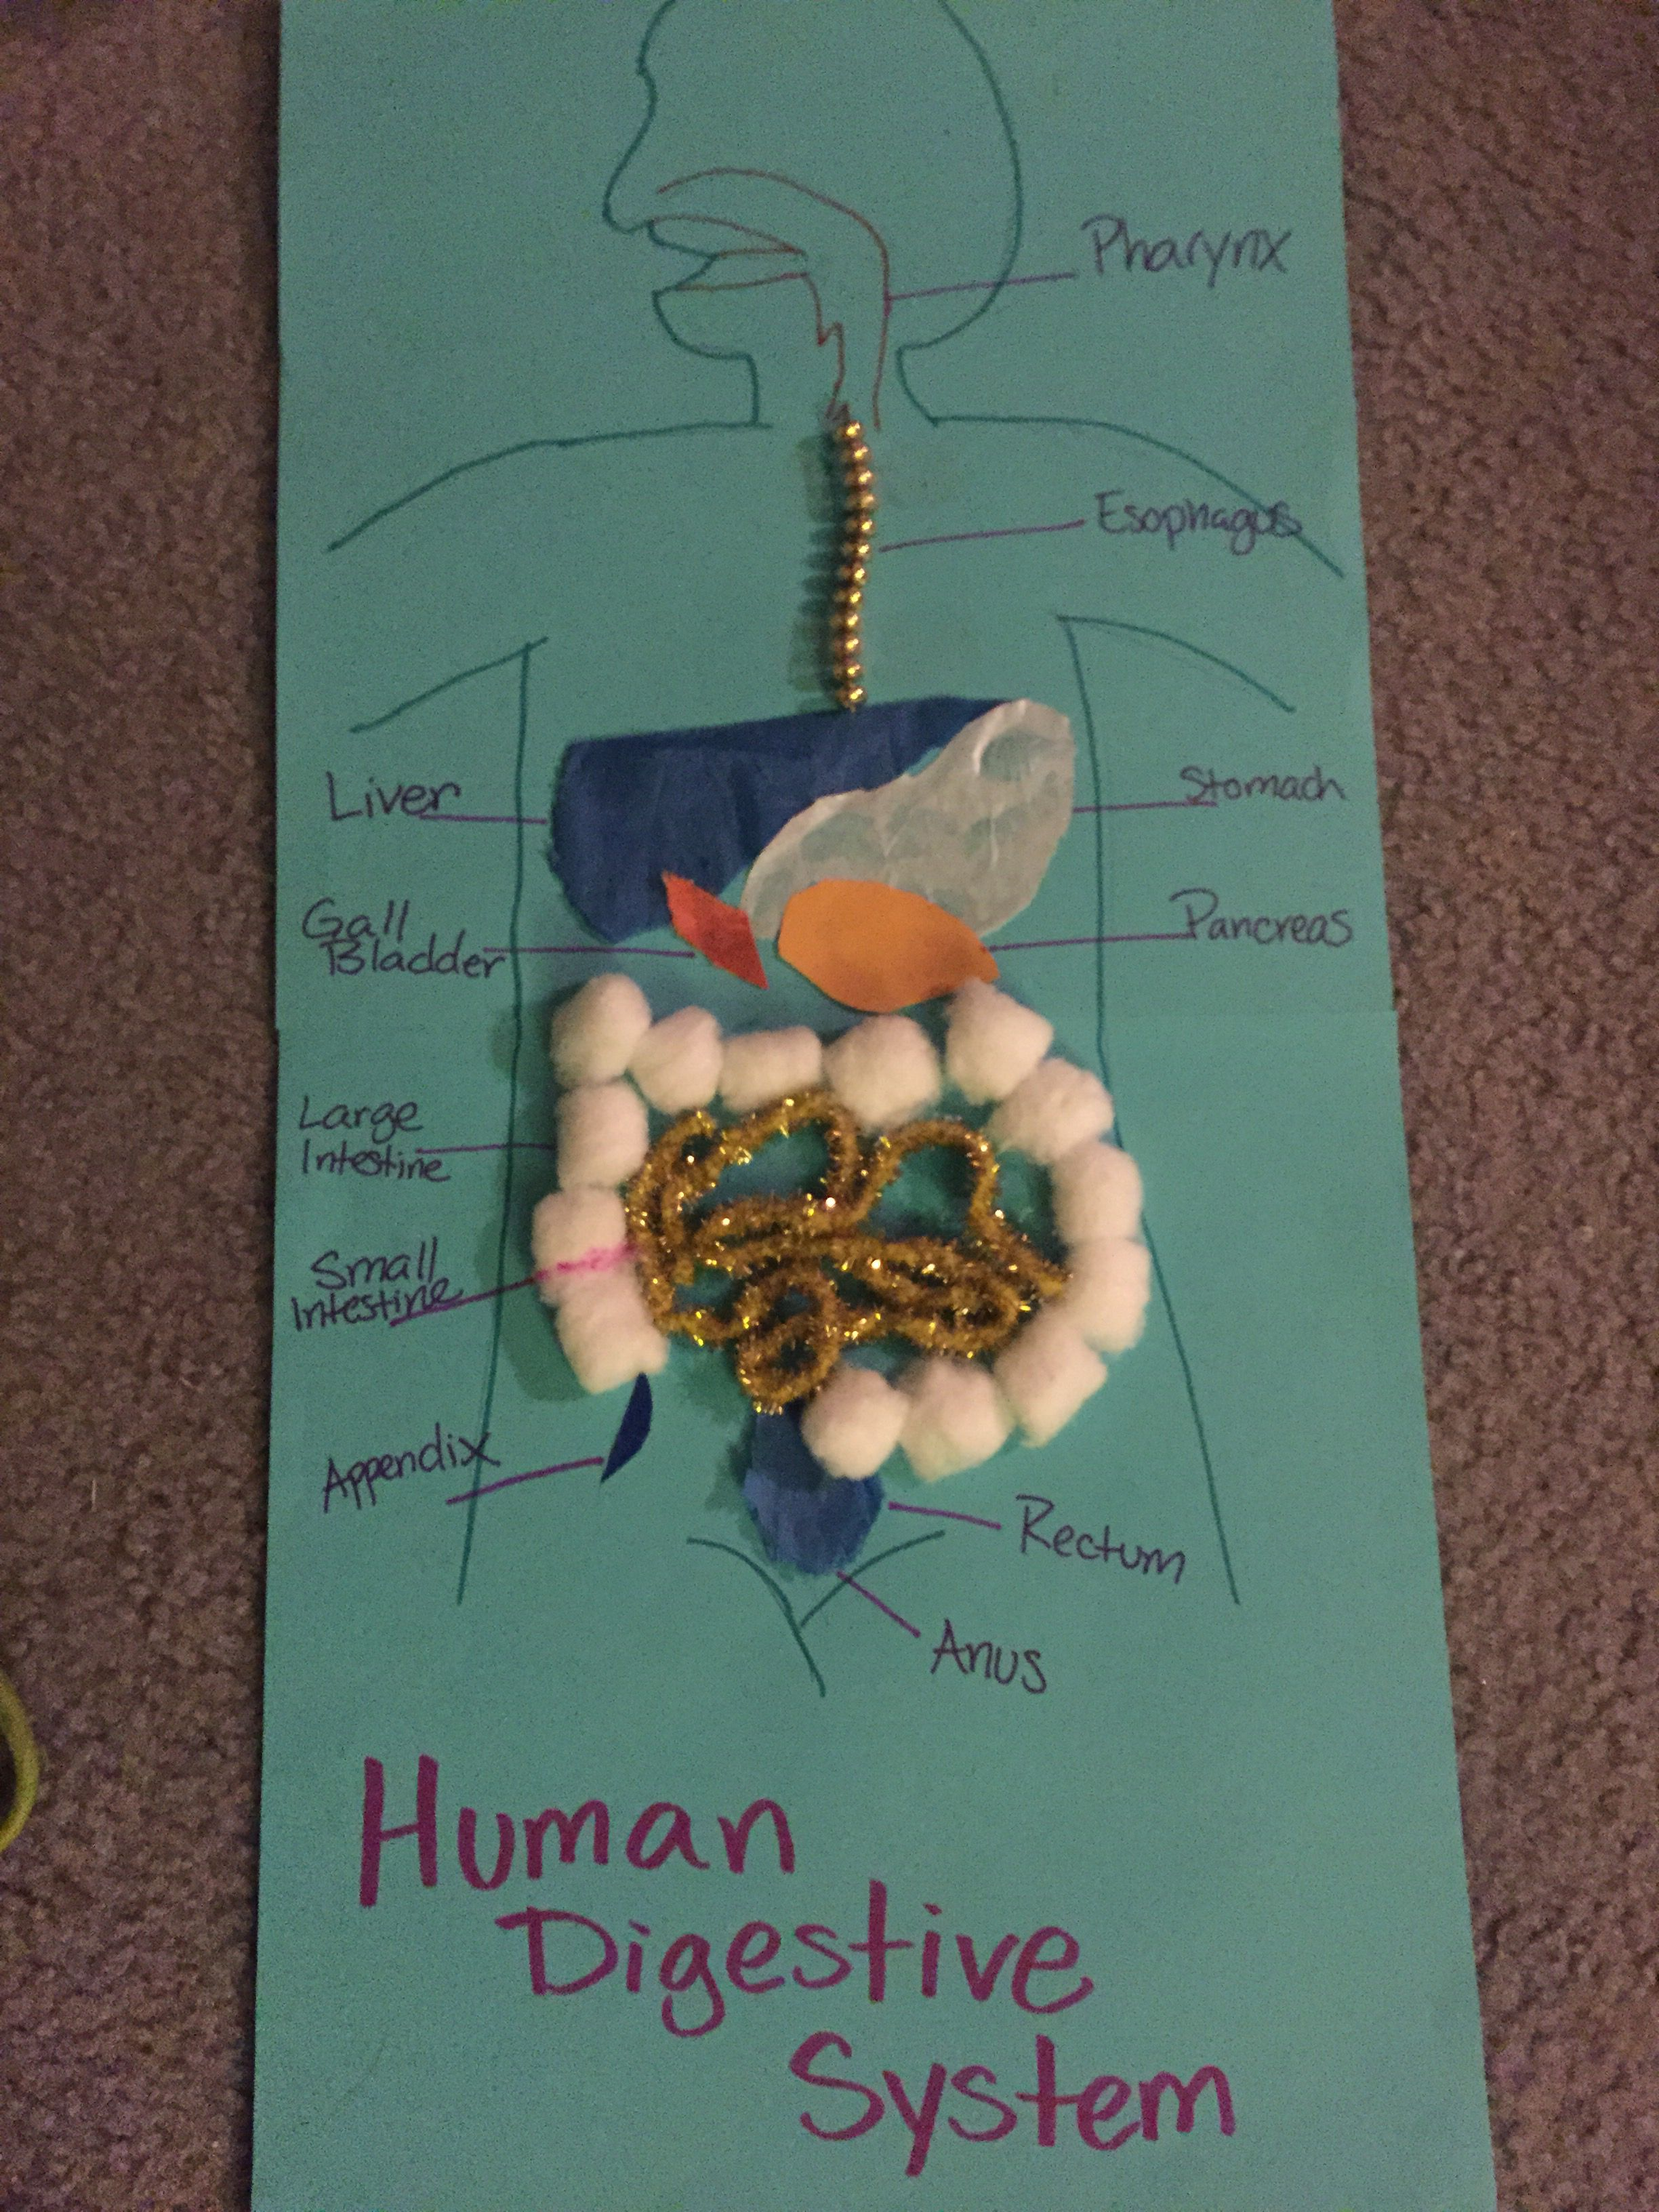 Human Digestive System Created By Random Stuff I Had